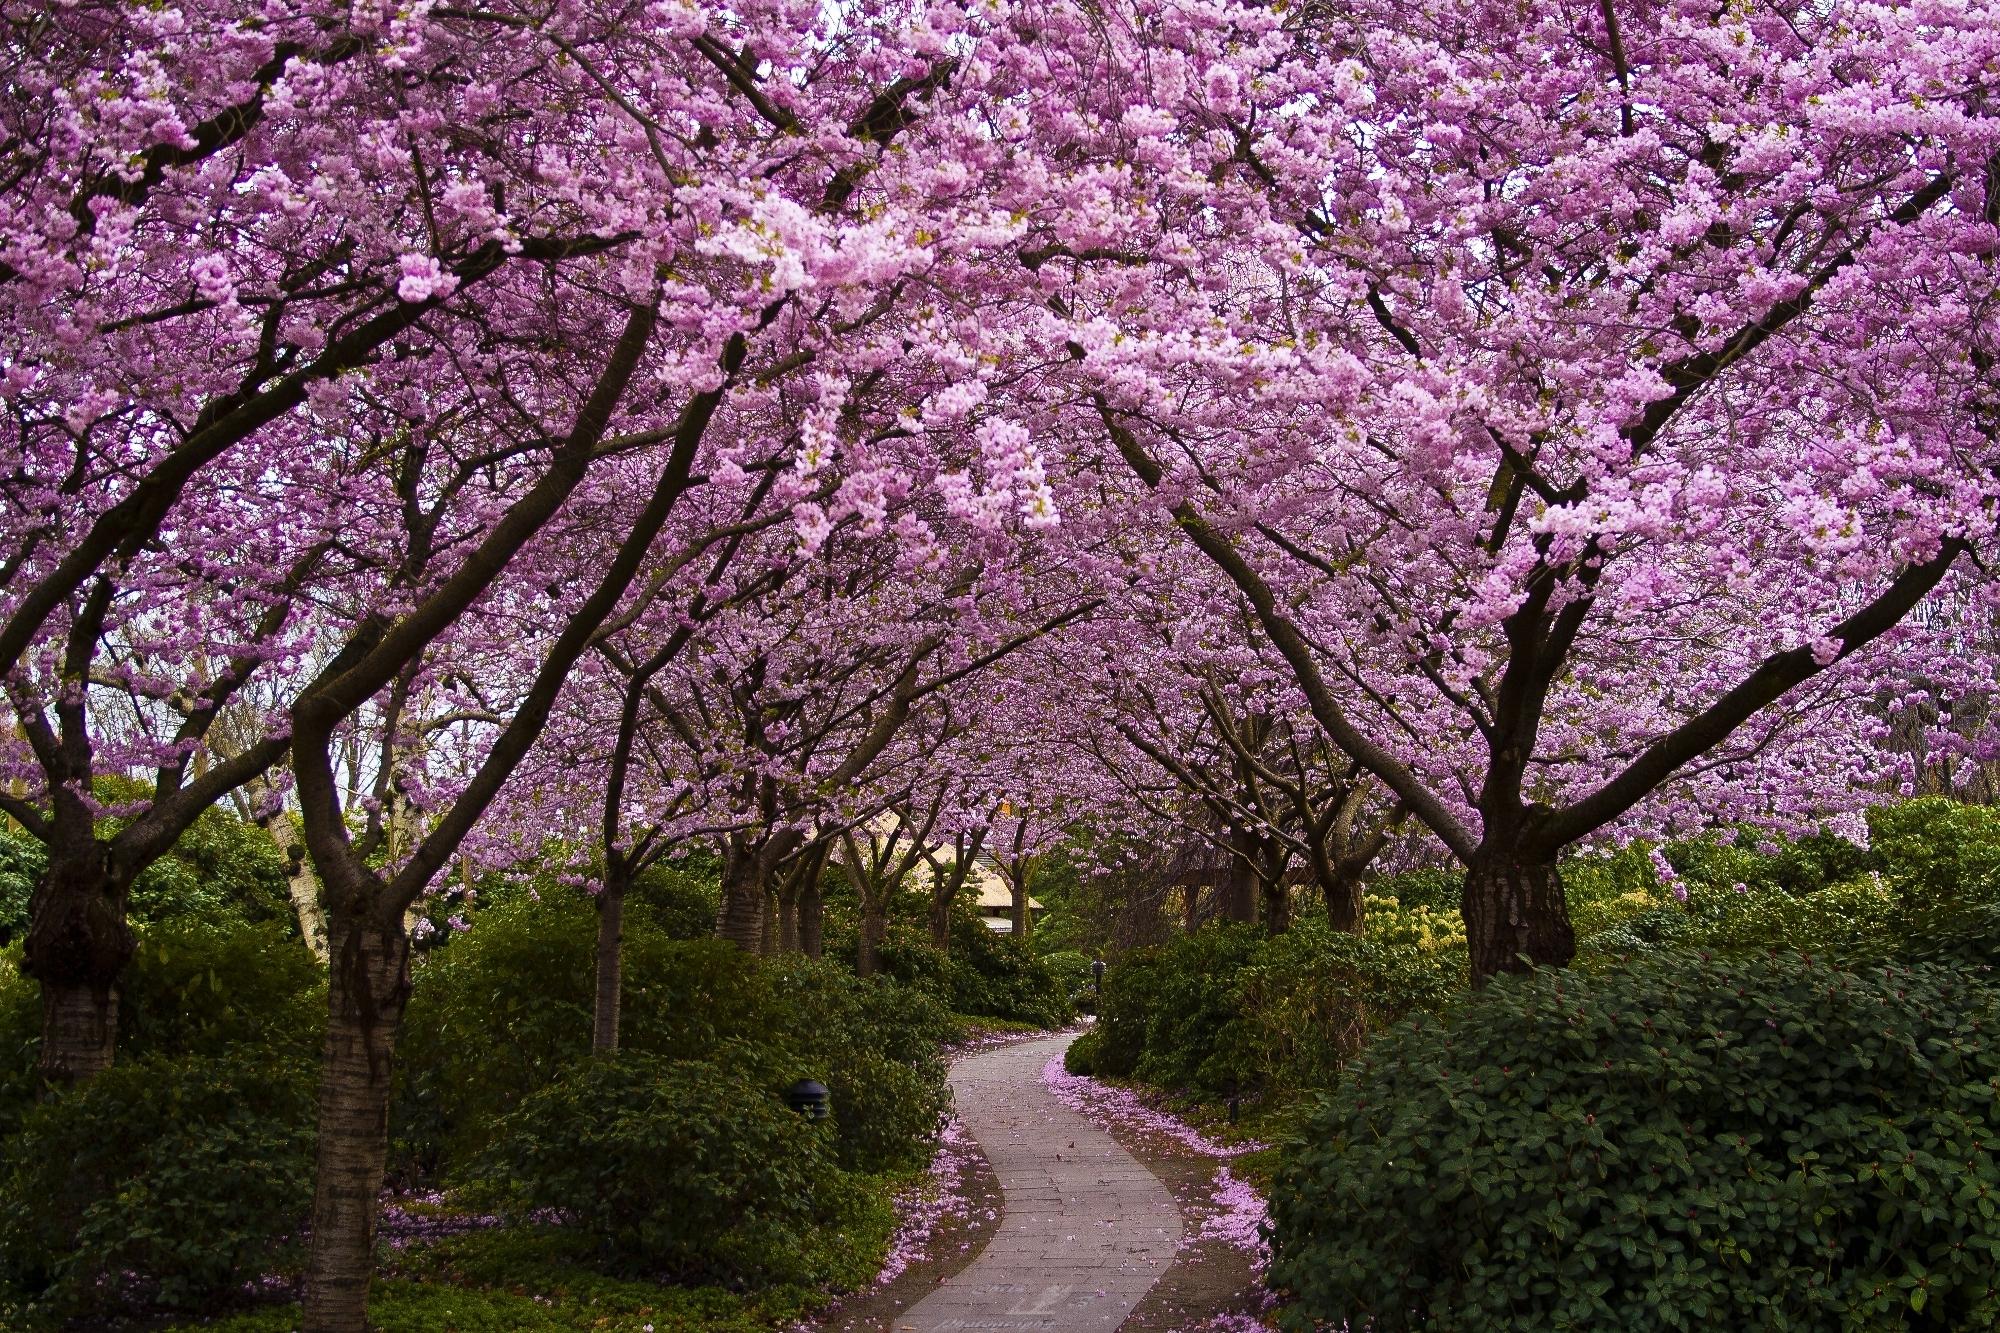 spring wallpaper purple